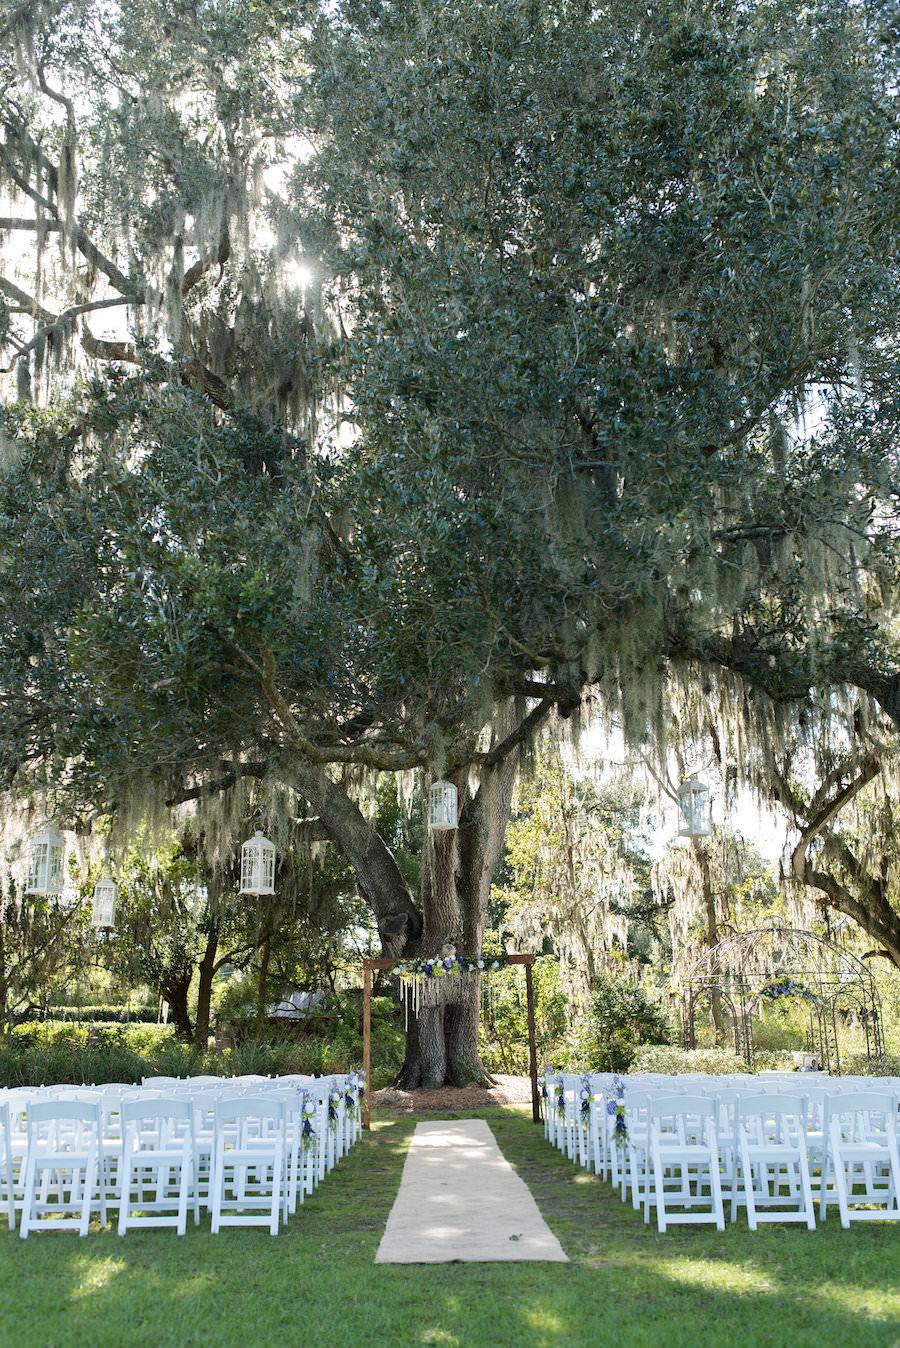 Rustic Outdoor Wedding Ceremony under Spanish Moss Tree at Tampa Wedding Venue Cross Creek Ranch | Photographer Caroline and Evan Photography